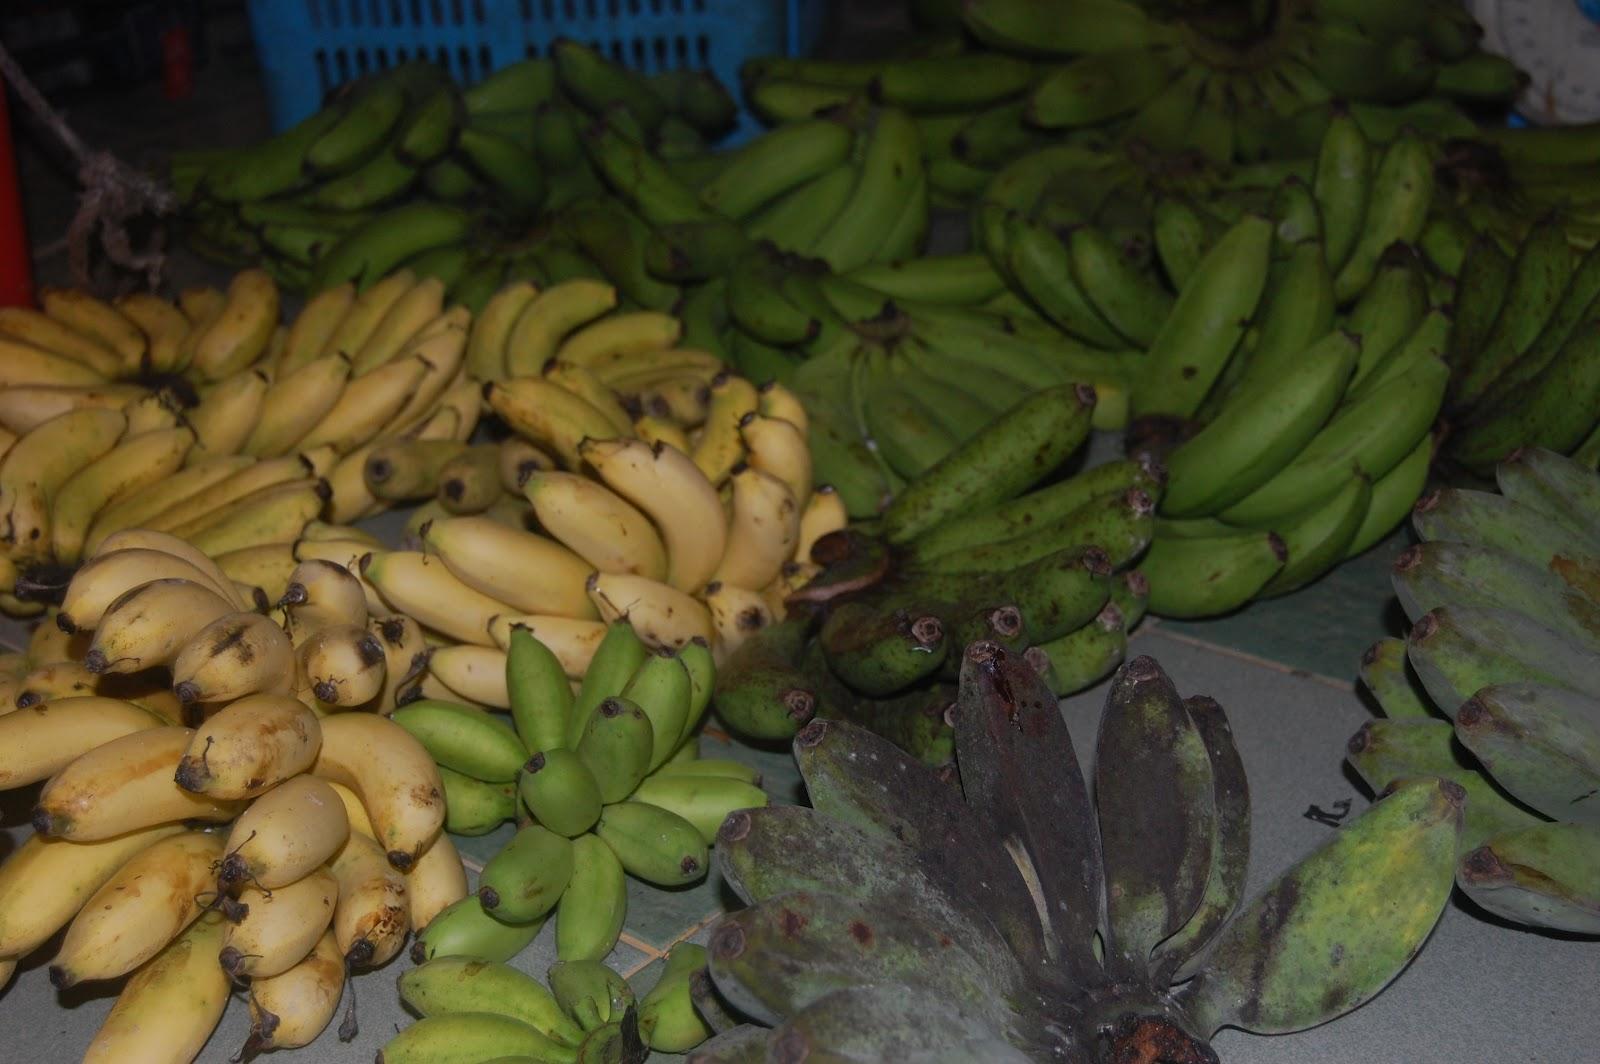 Bananas Pisang Abu Suria Helang Lui